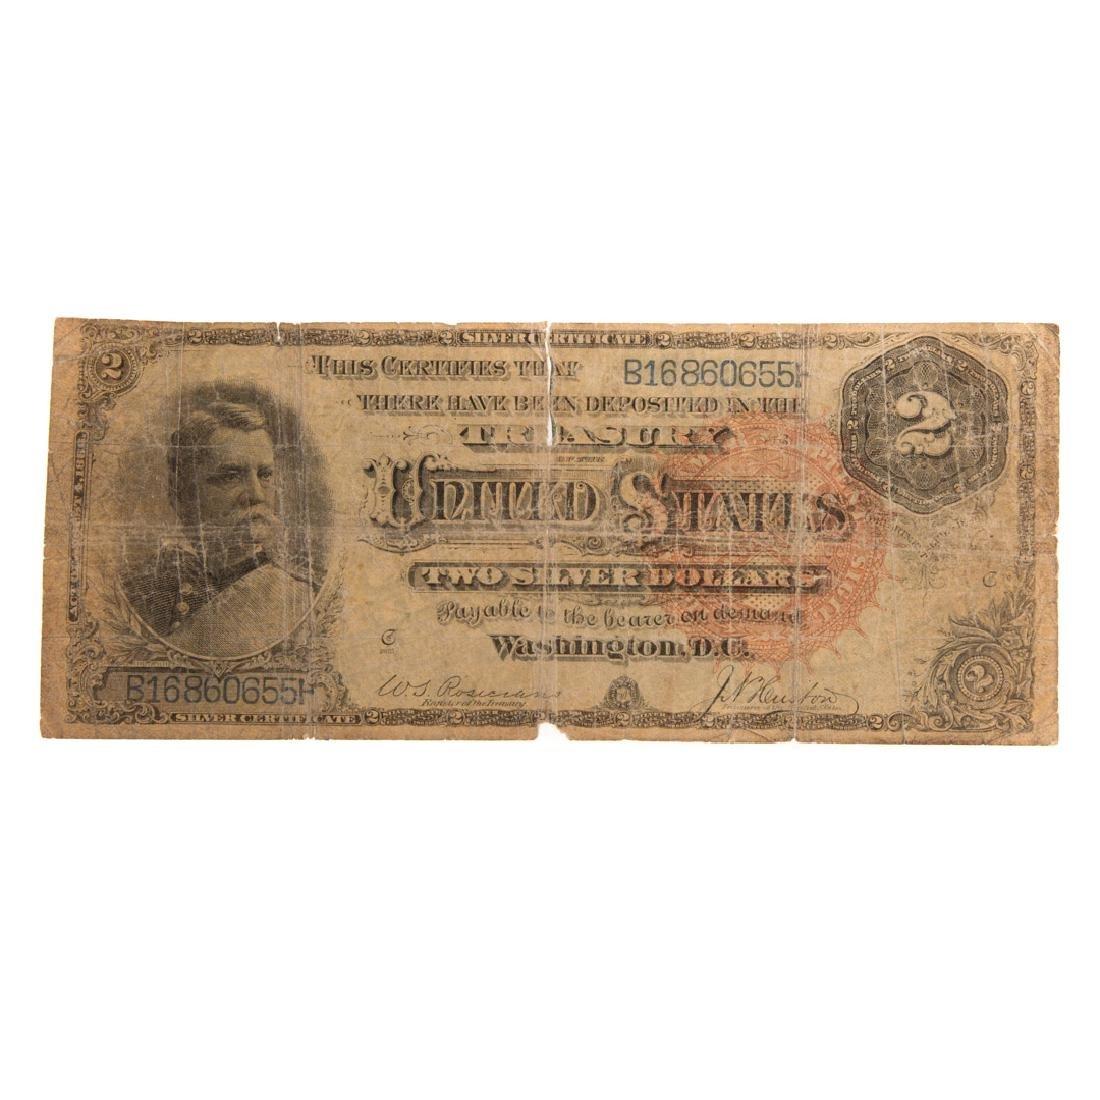 [US] 1886 $2 Silver Certificate FR-243